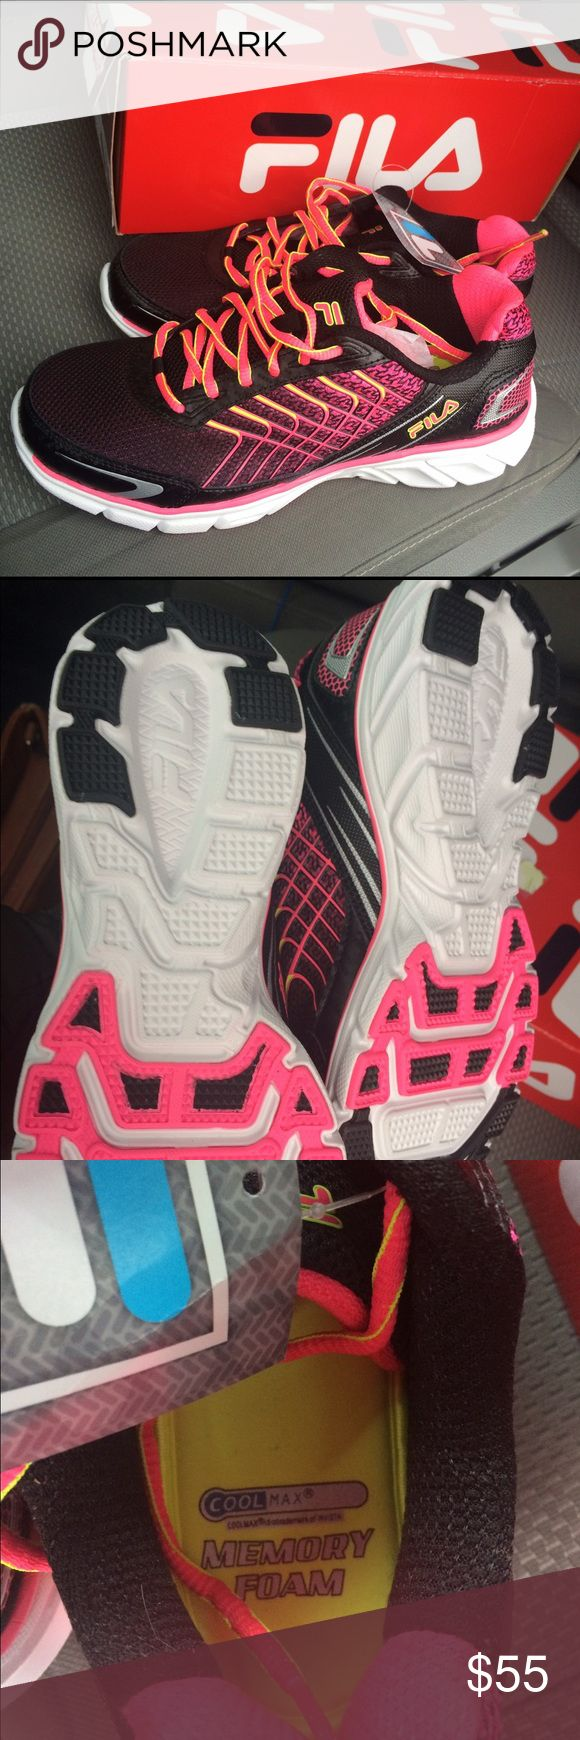 Fila black/pink Cool Max Memory foam Sneakers New in box. Fila memory foam sneakers. Size 8.5 Fila Shoes Athletic Shoes